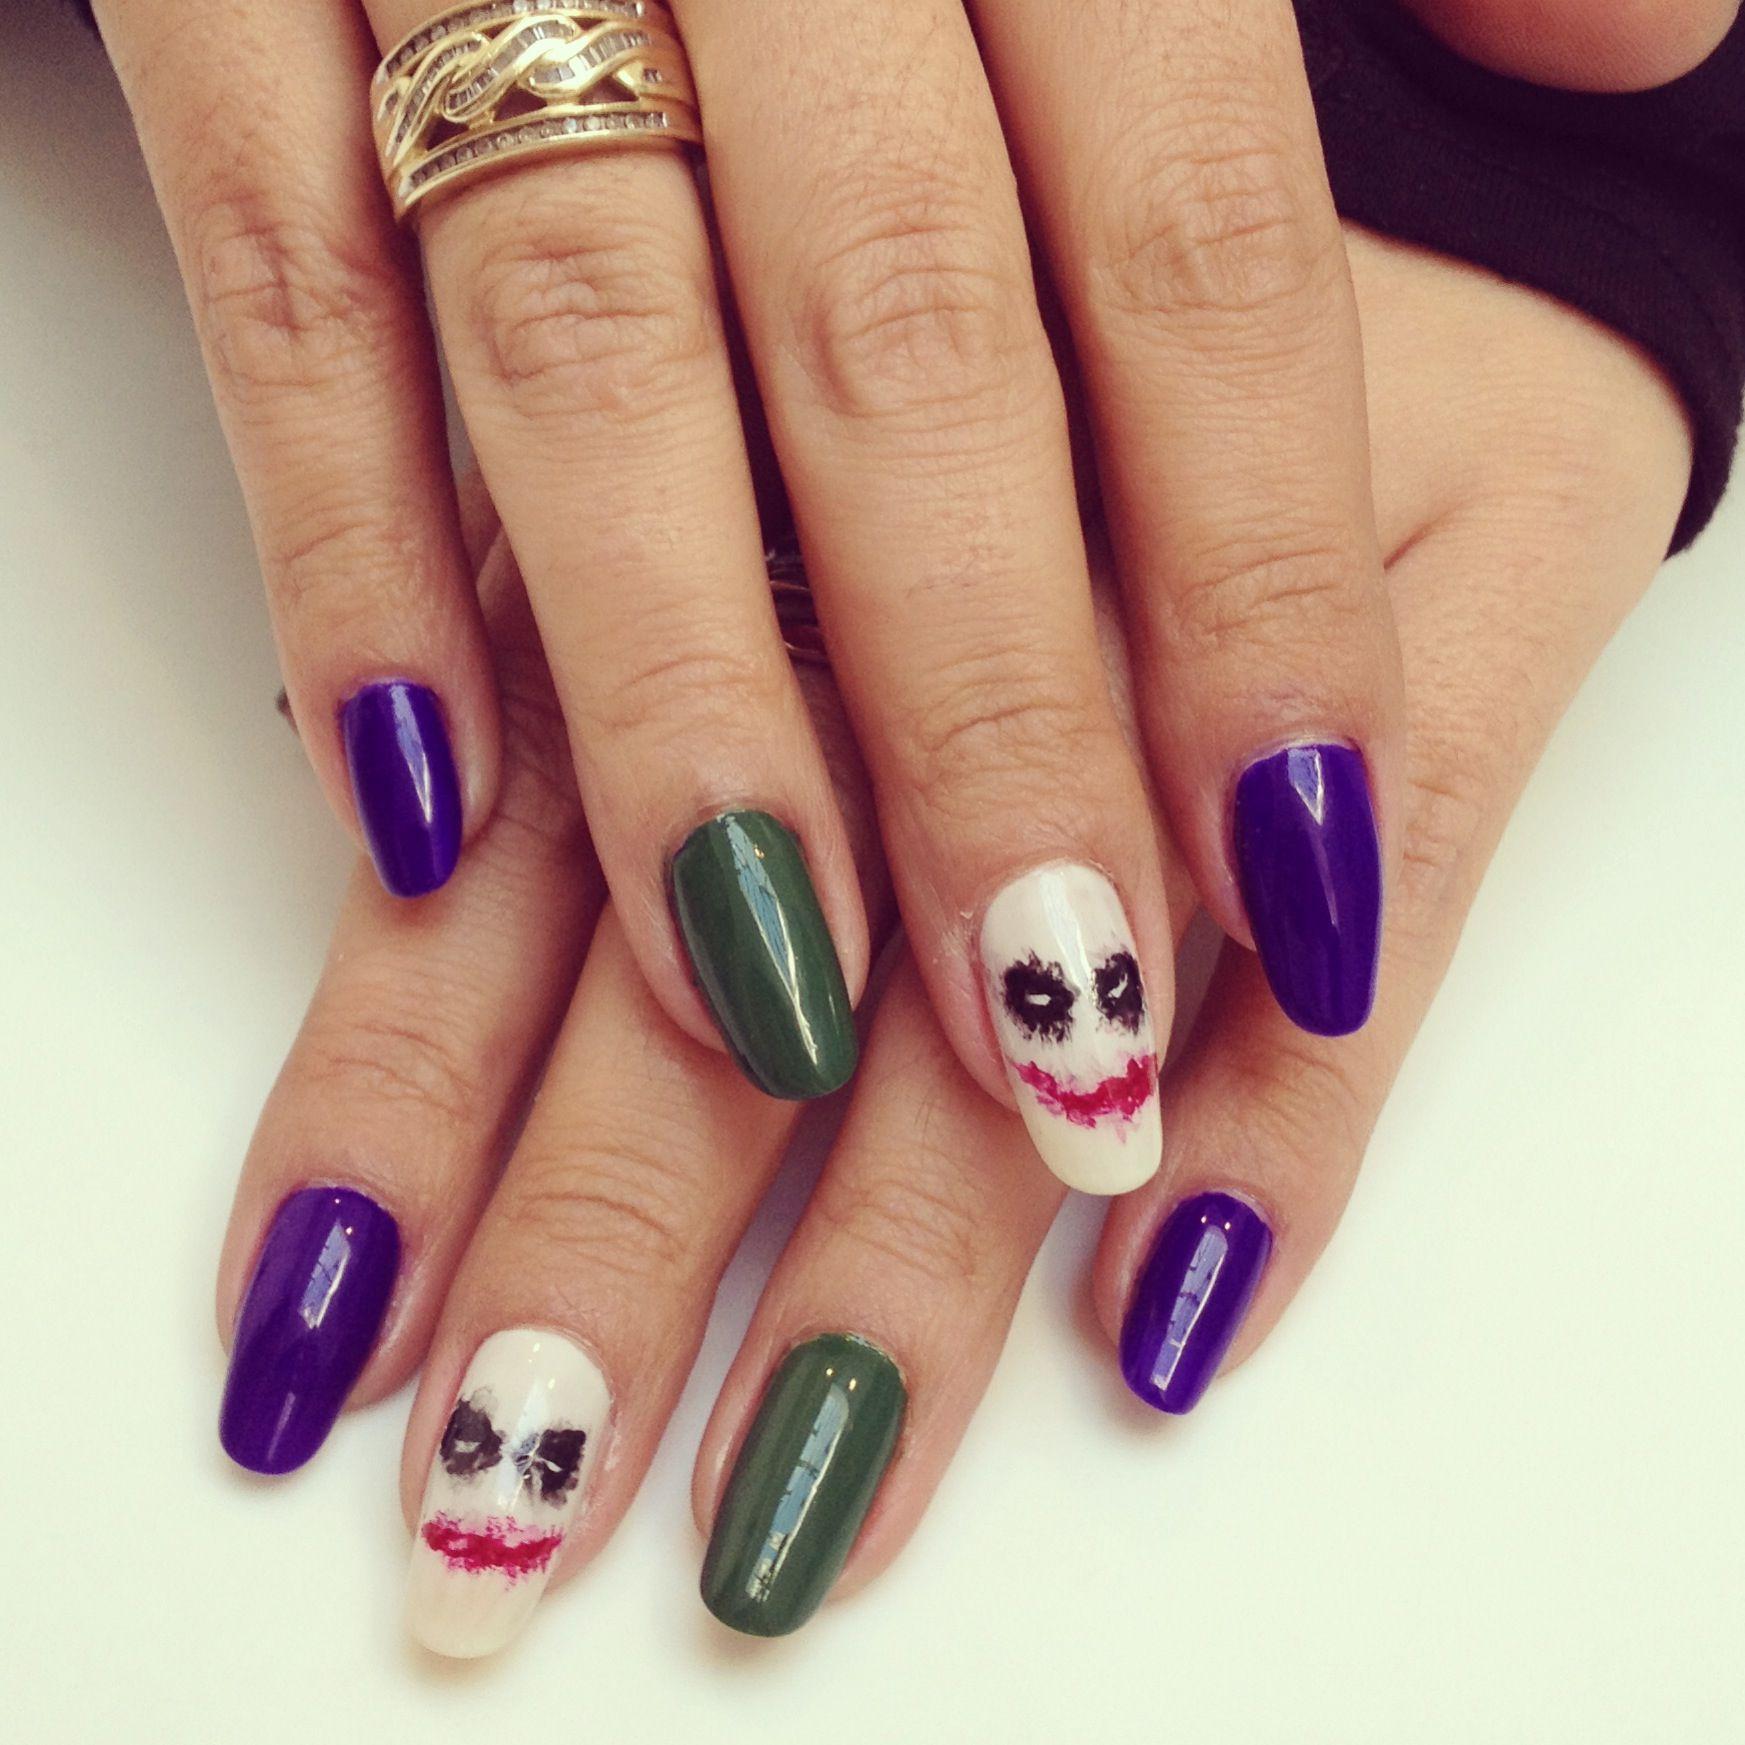 My Joker nails! Happy Halloween! #nails #halloweennails ...